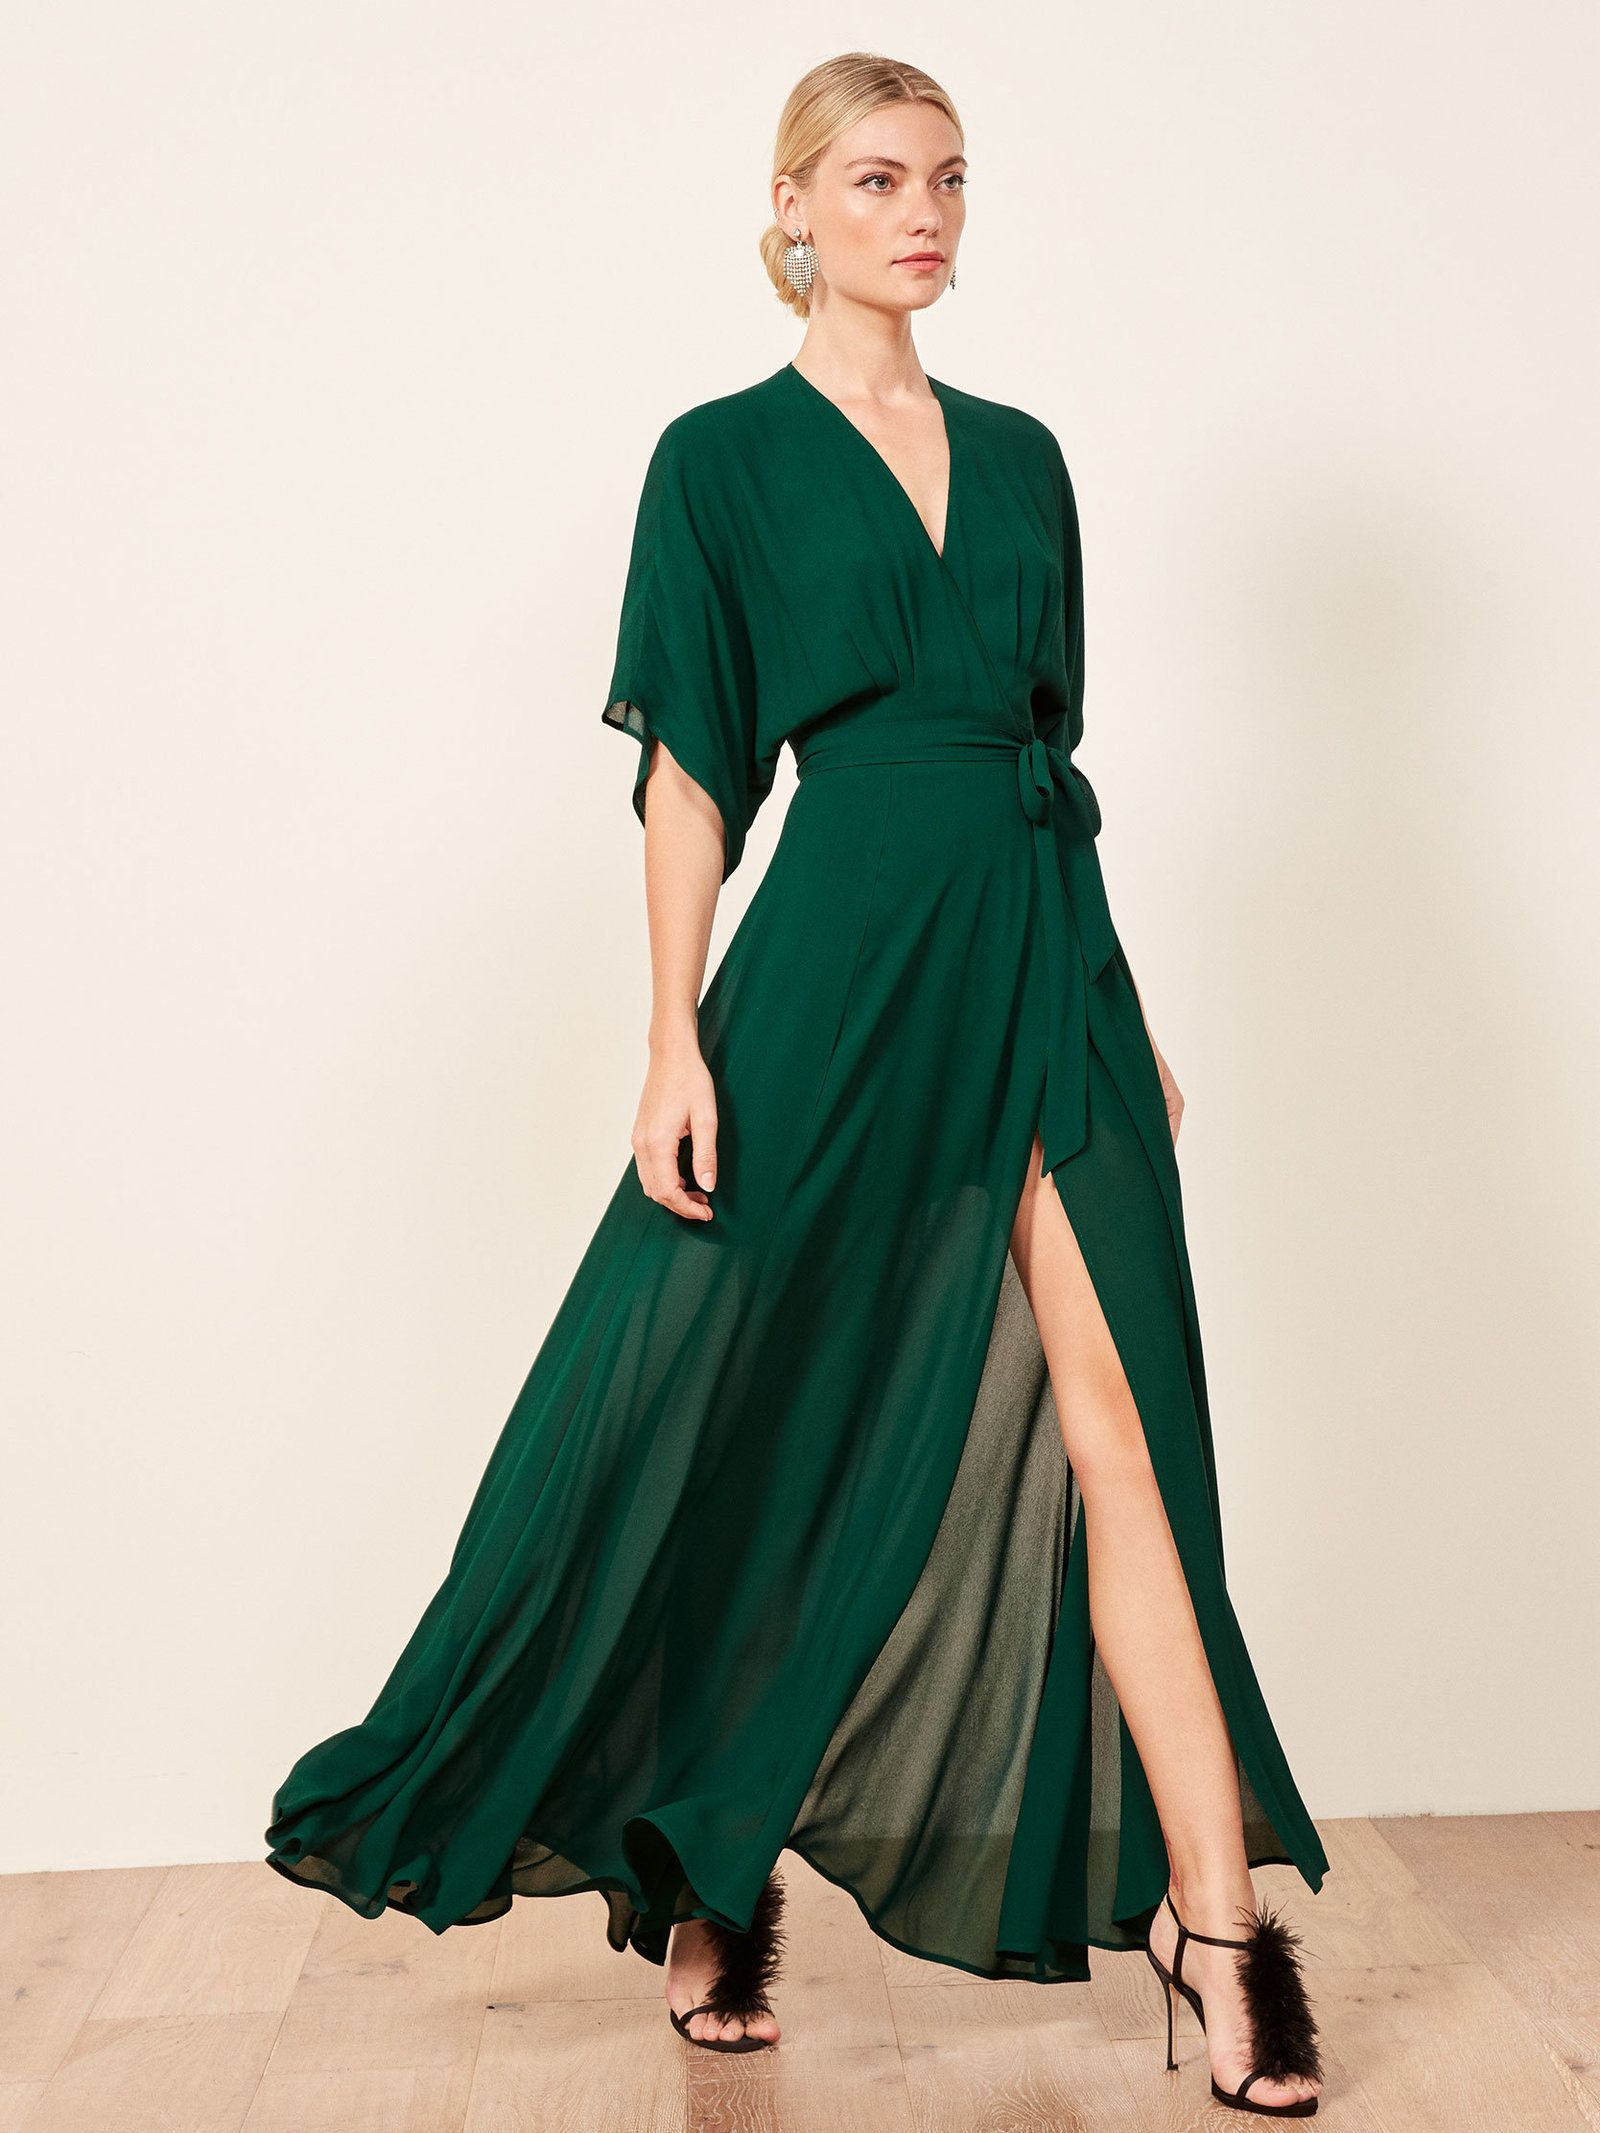 c03a0c55ee3 The Winslow Dress